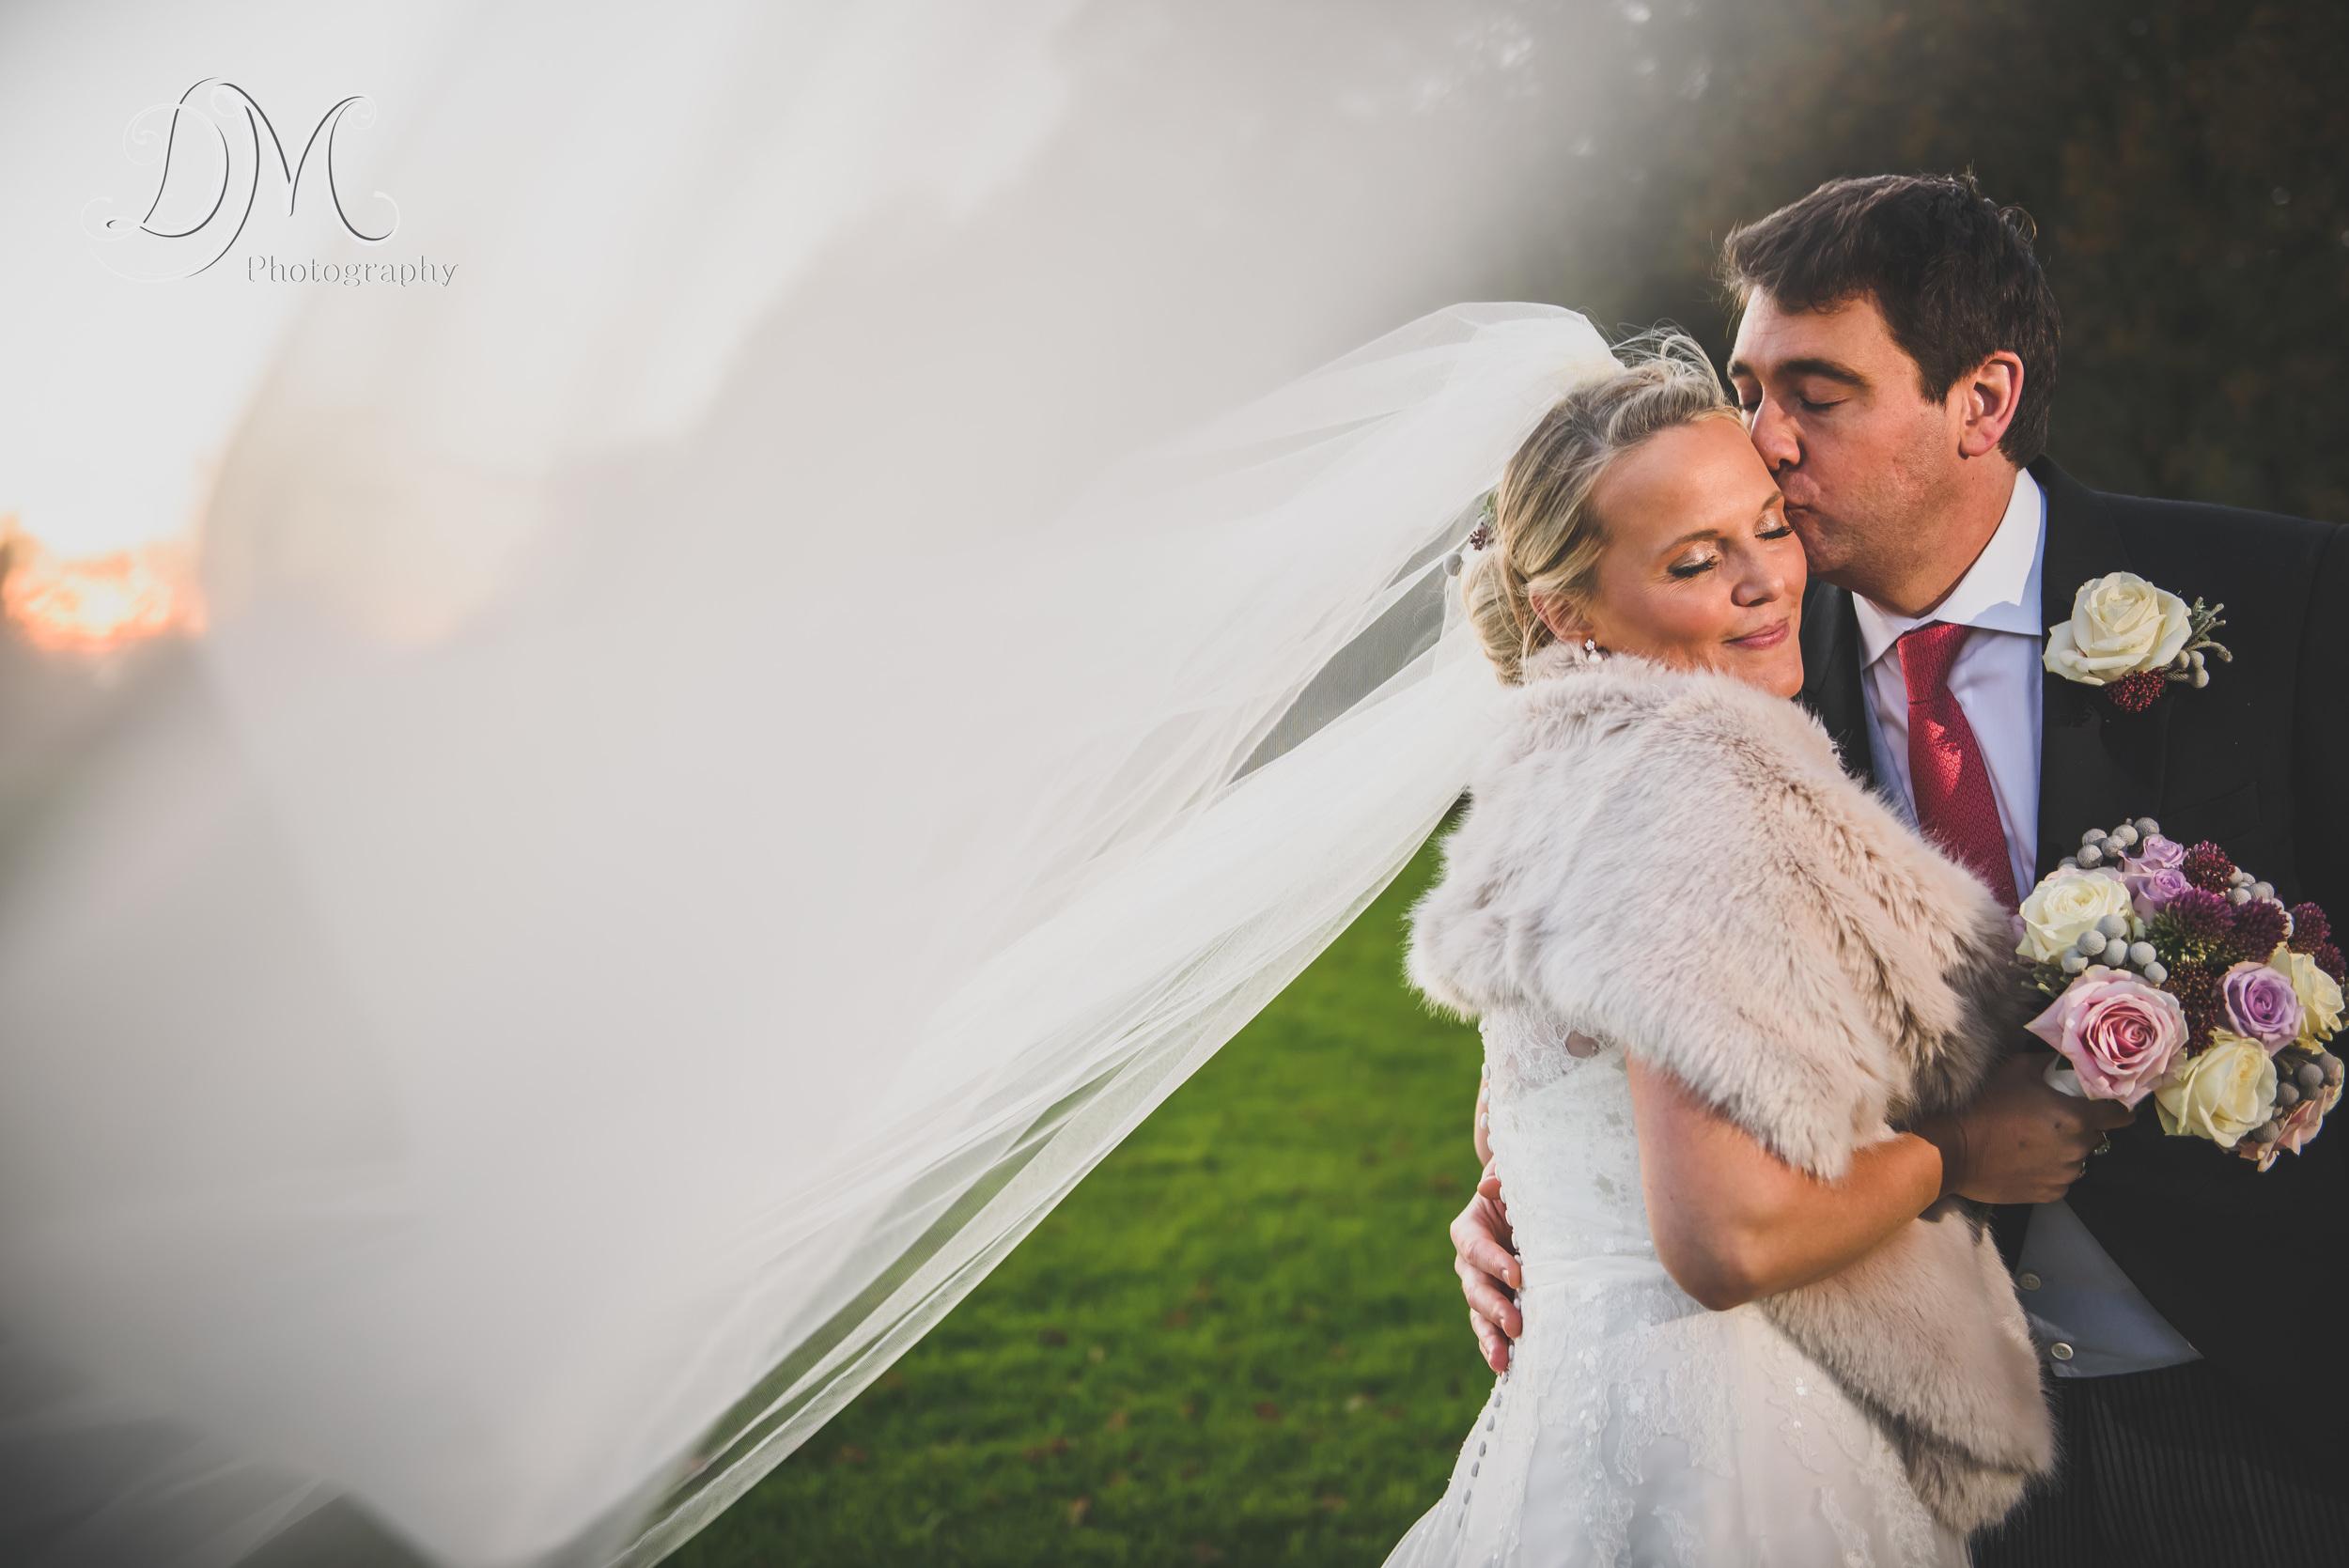 Farnham Wedding Photorgraphy, Surrey, Northbrook Park, DM Photography